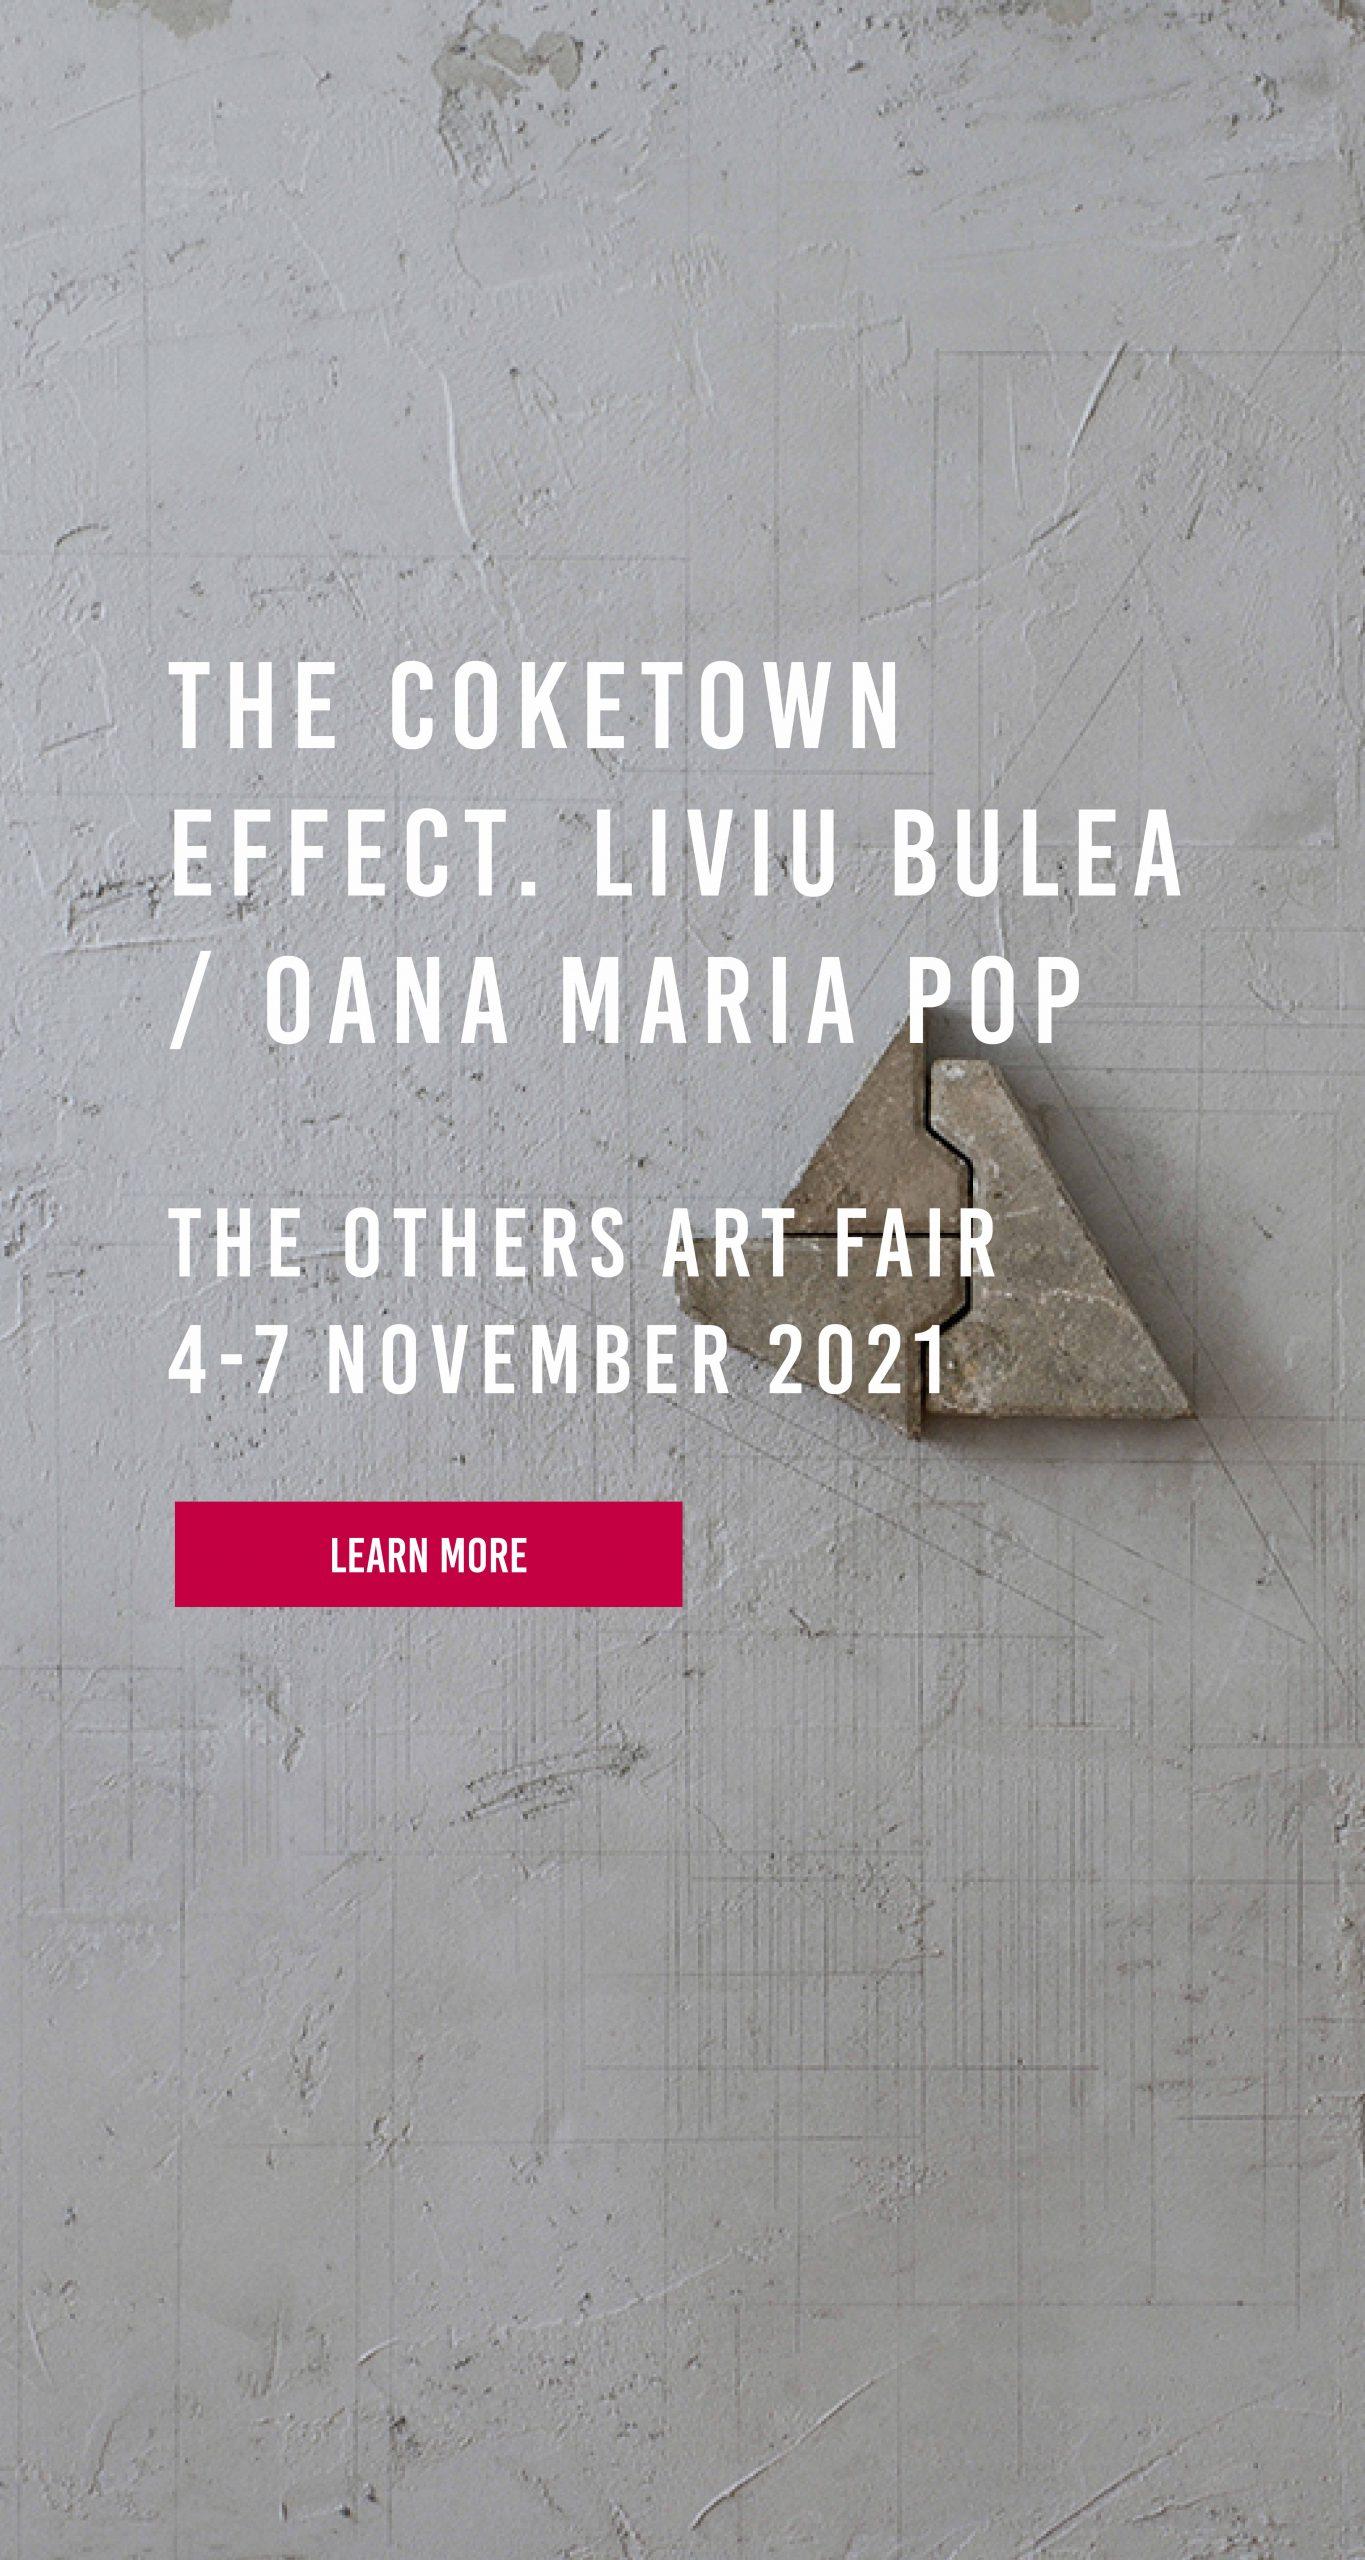 The Coketown effect